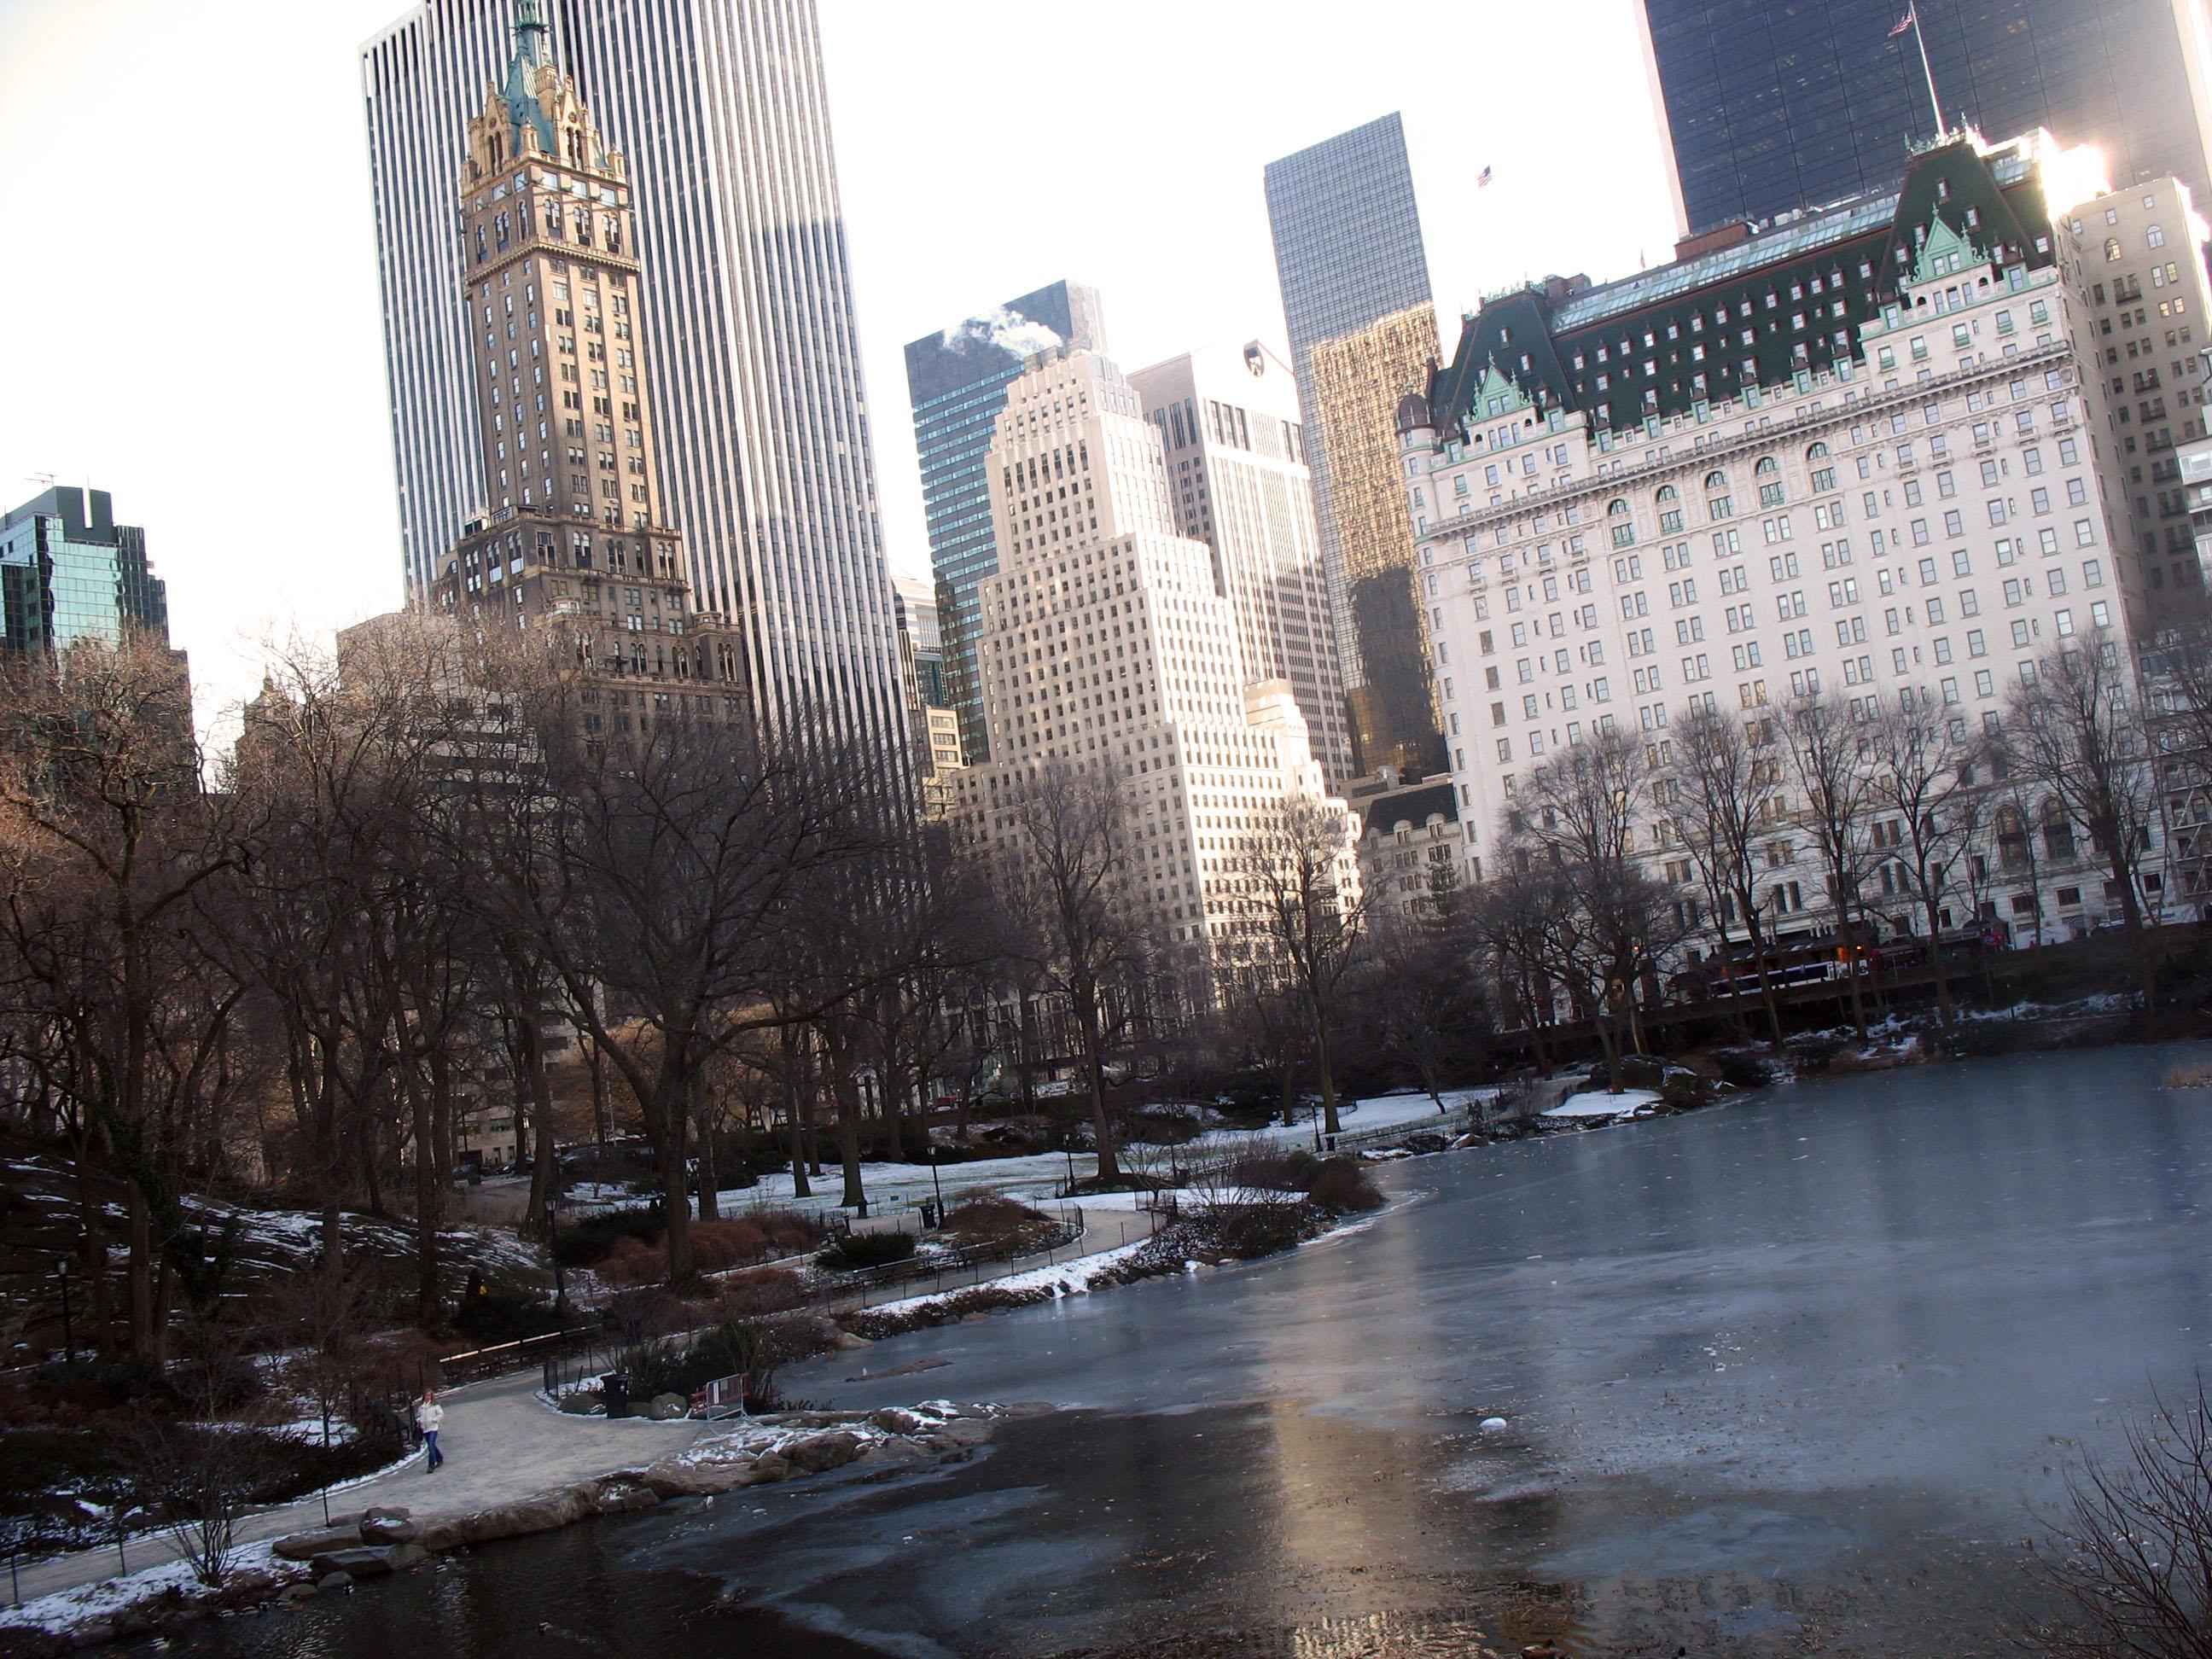 Centralpark_winter1